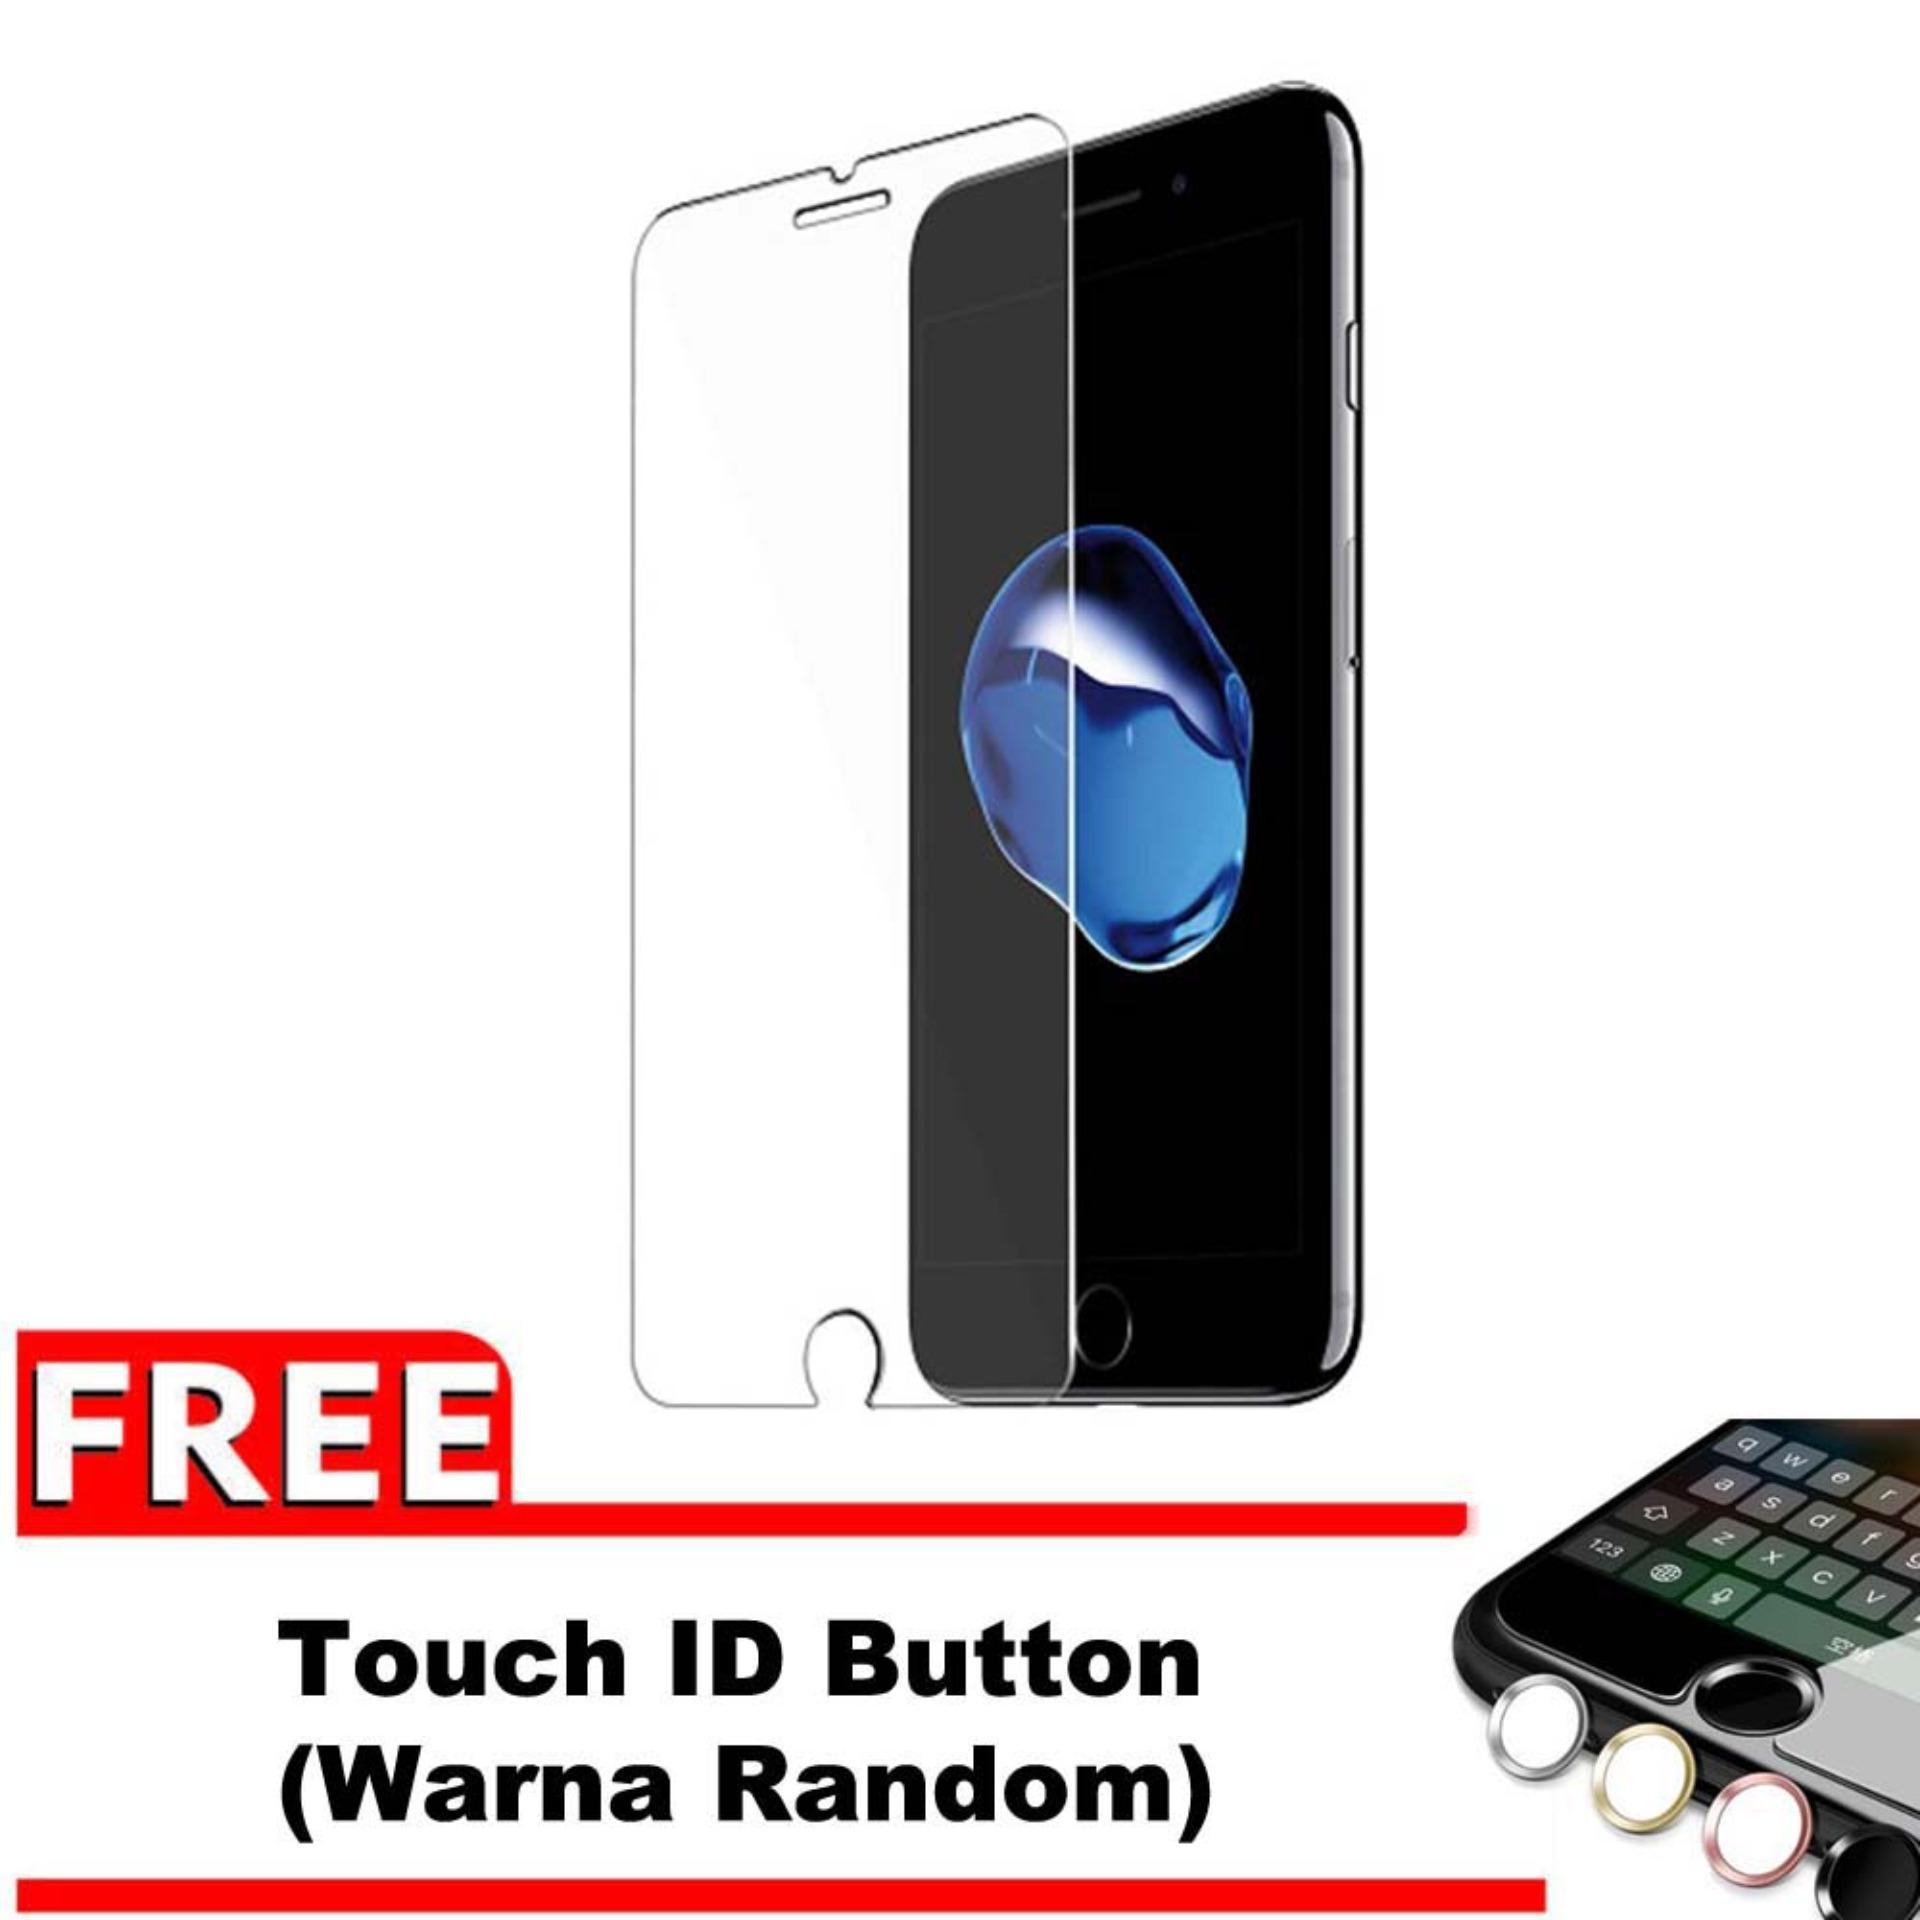 Vn Apple iPhone 8+ / 8S+ / 8G+ Plus (5.5